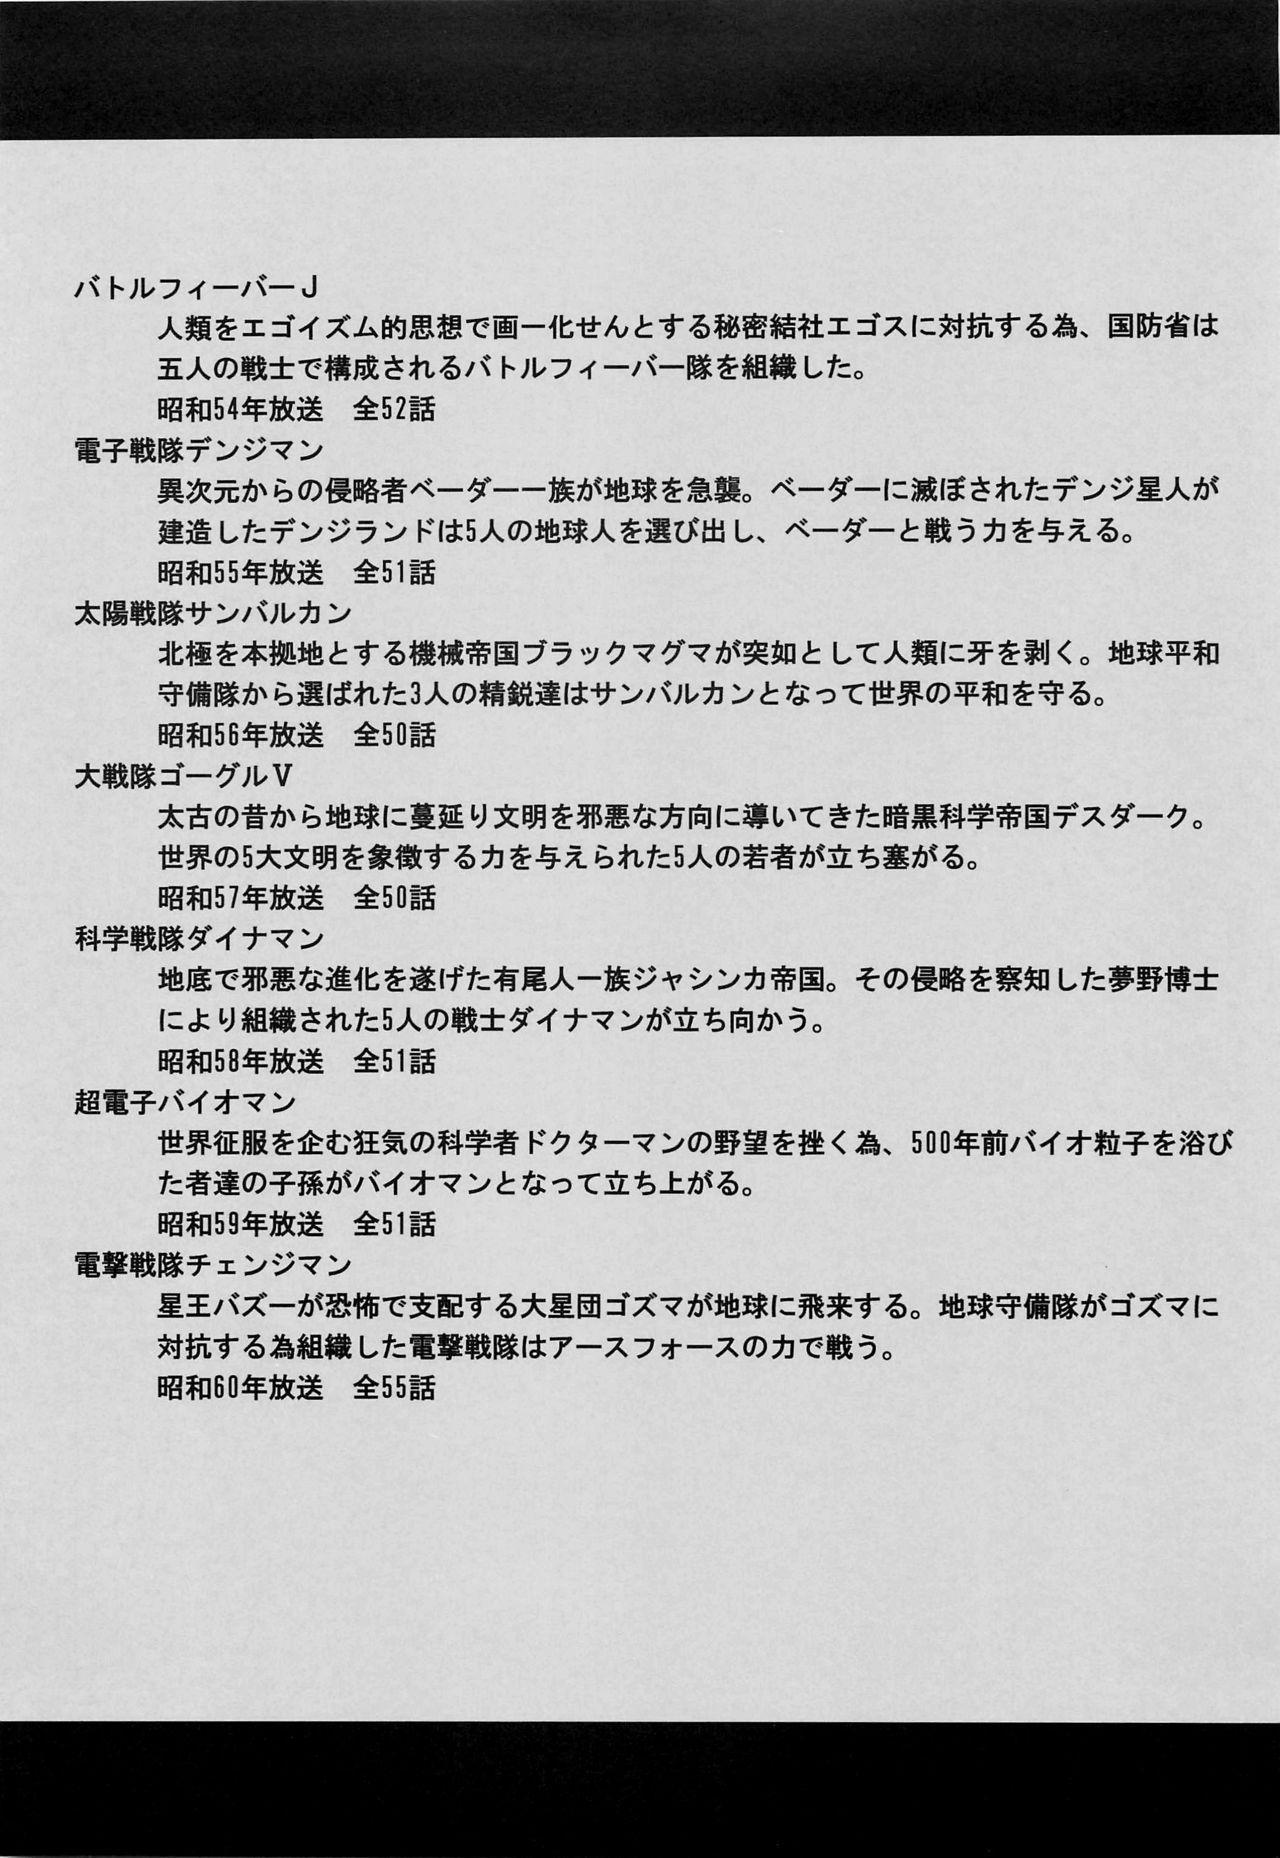 <<Tokusatsu>> Superheroine Sentai 80's 3